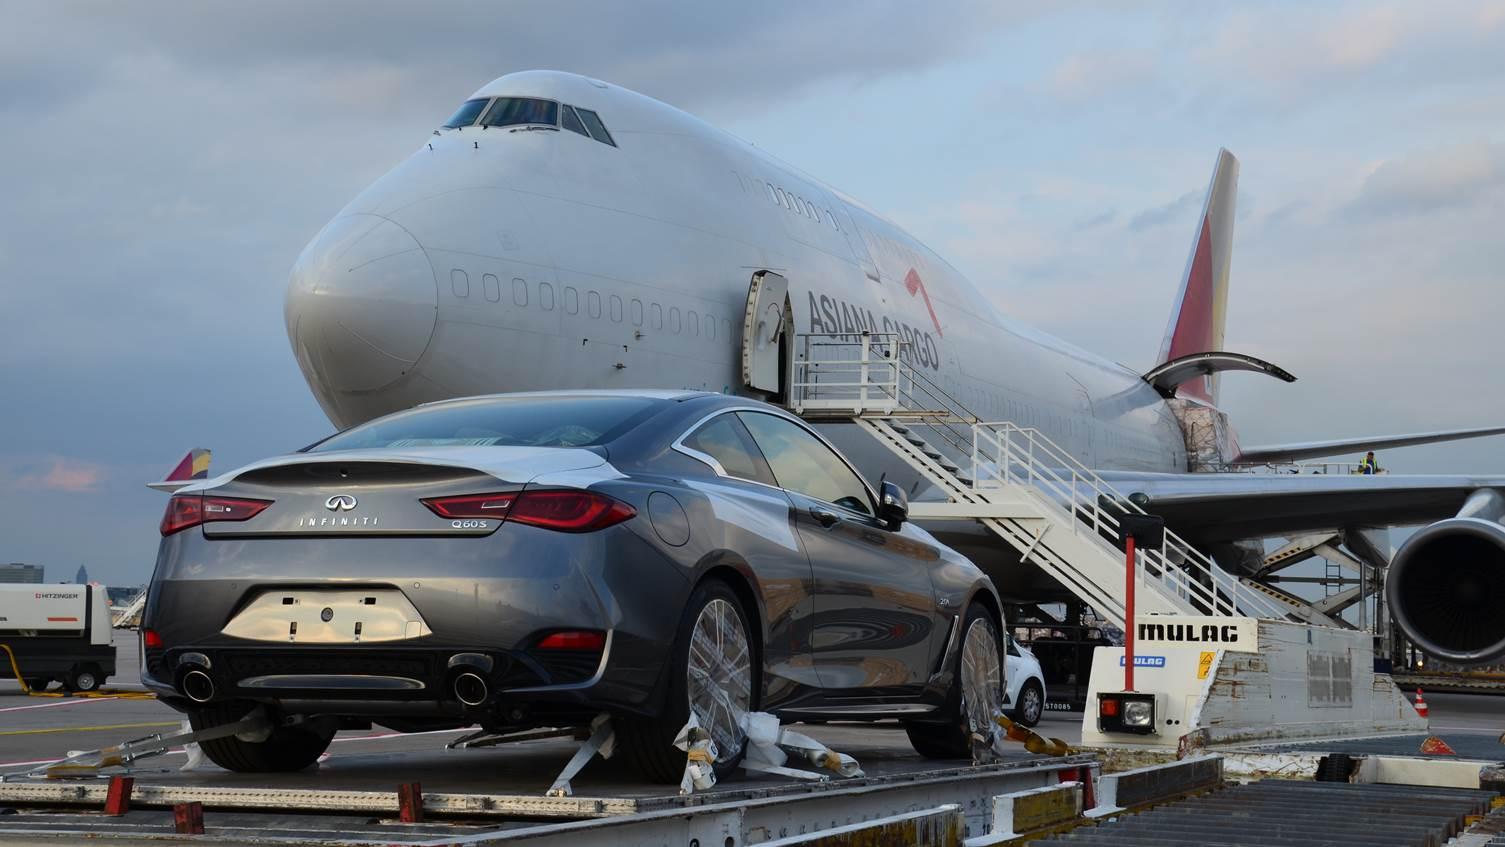 Alexander Global Logistics Germany Becomes IATA Certified